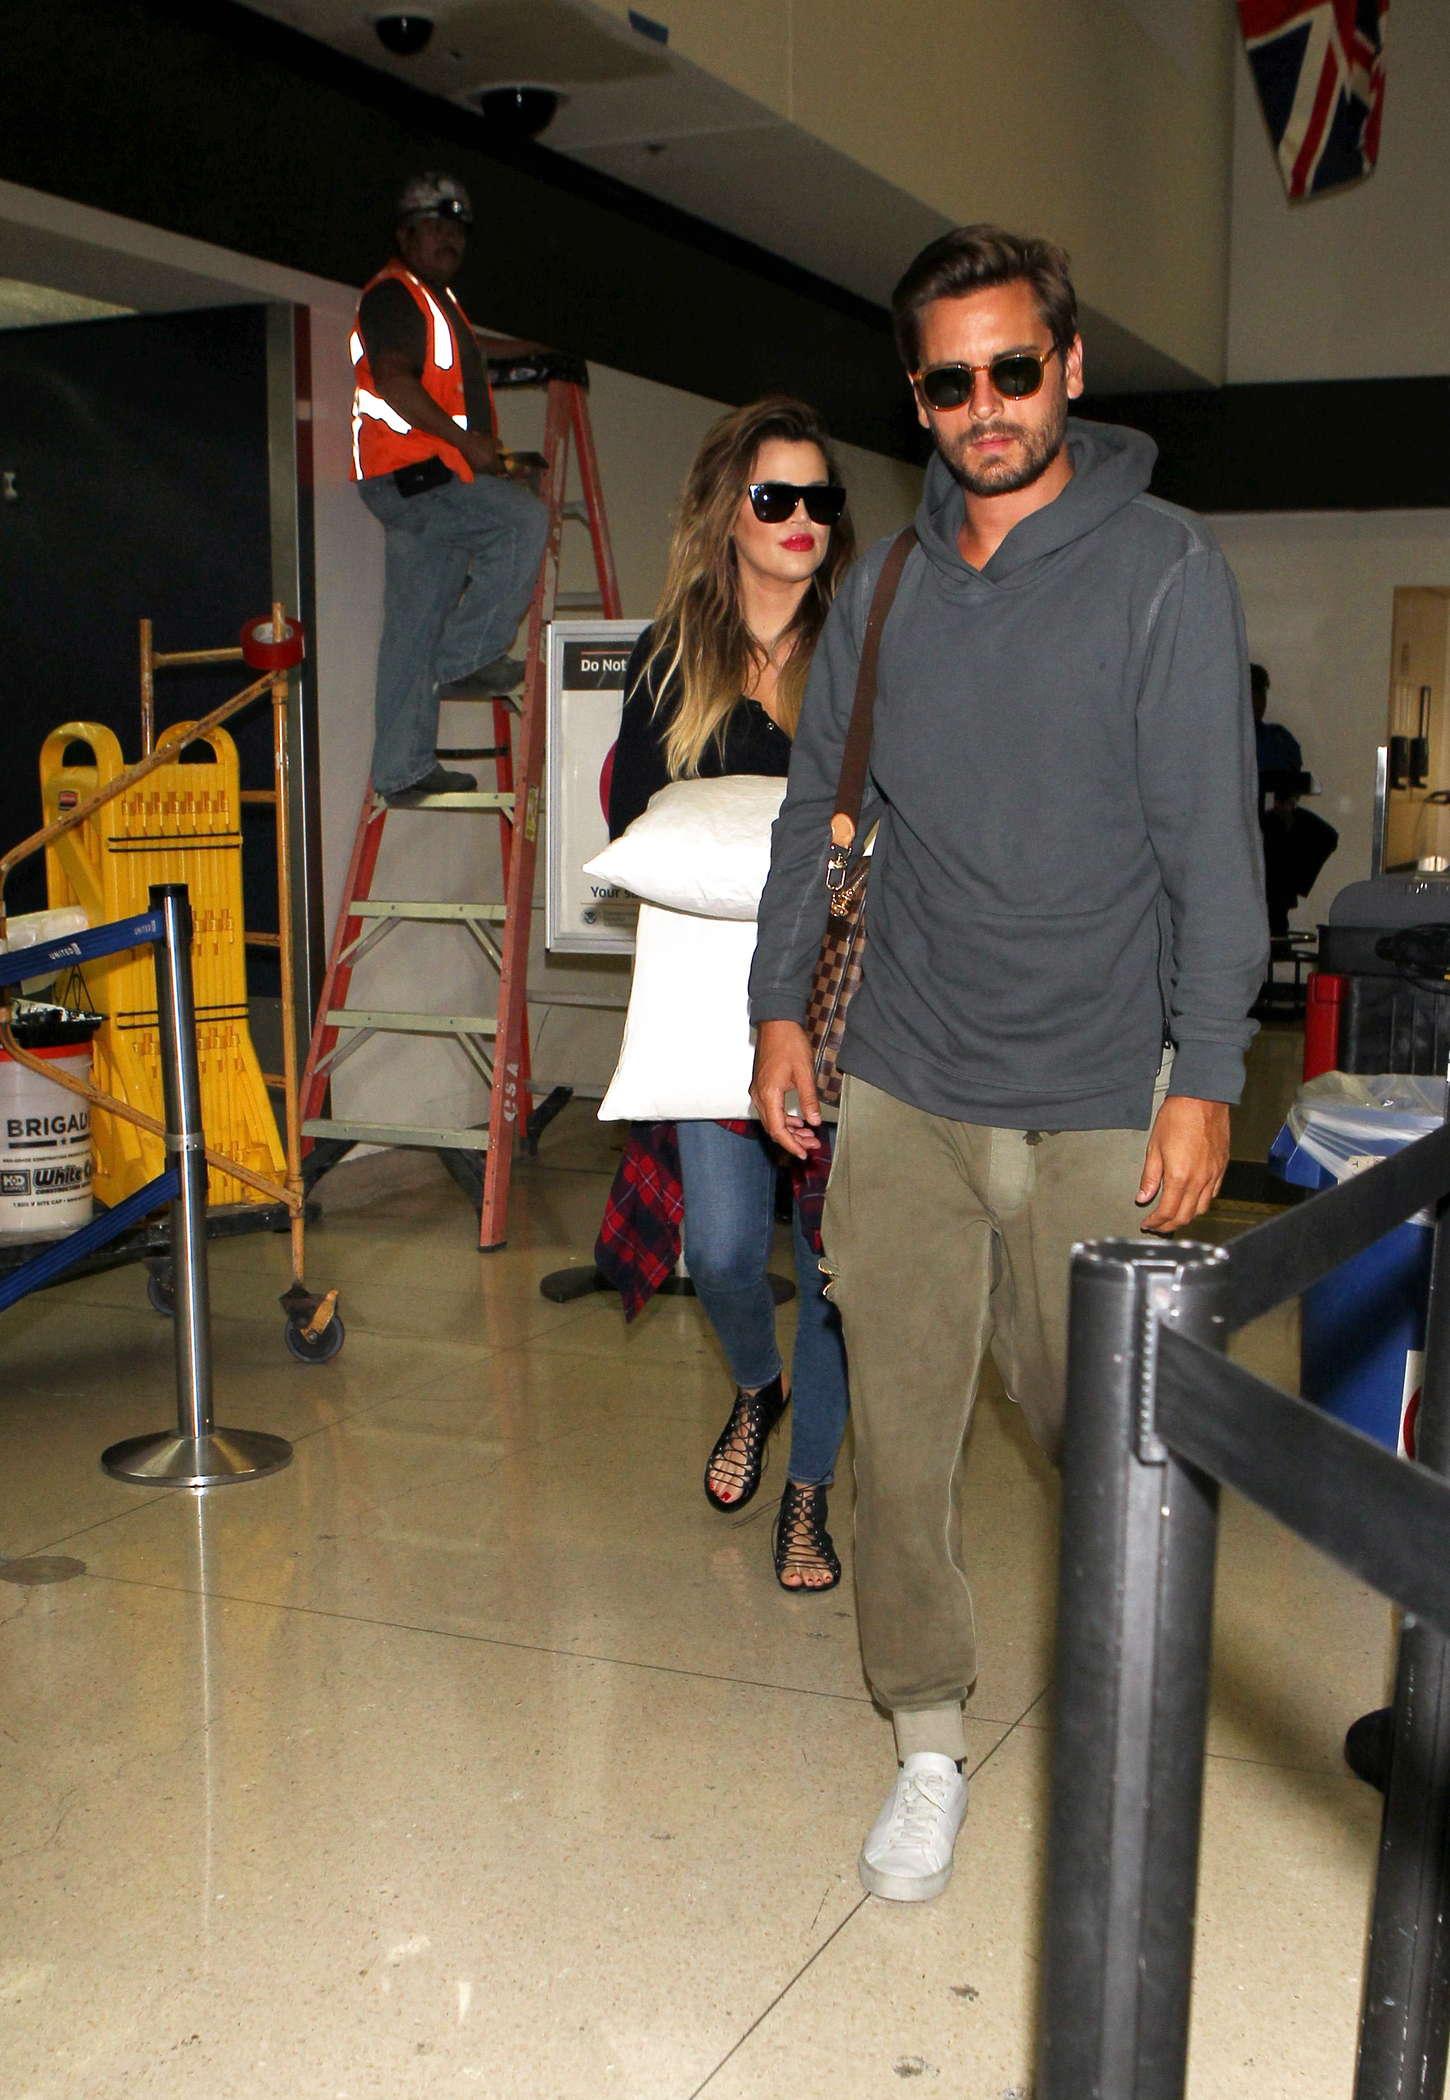 Khloe Kardashian 2014 : Khloe Kardashian with Scott Disick at LAX airport -11